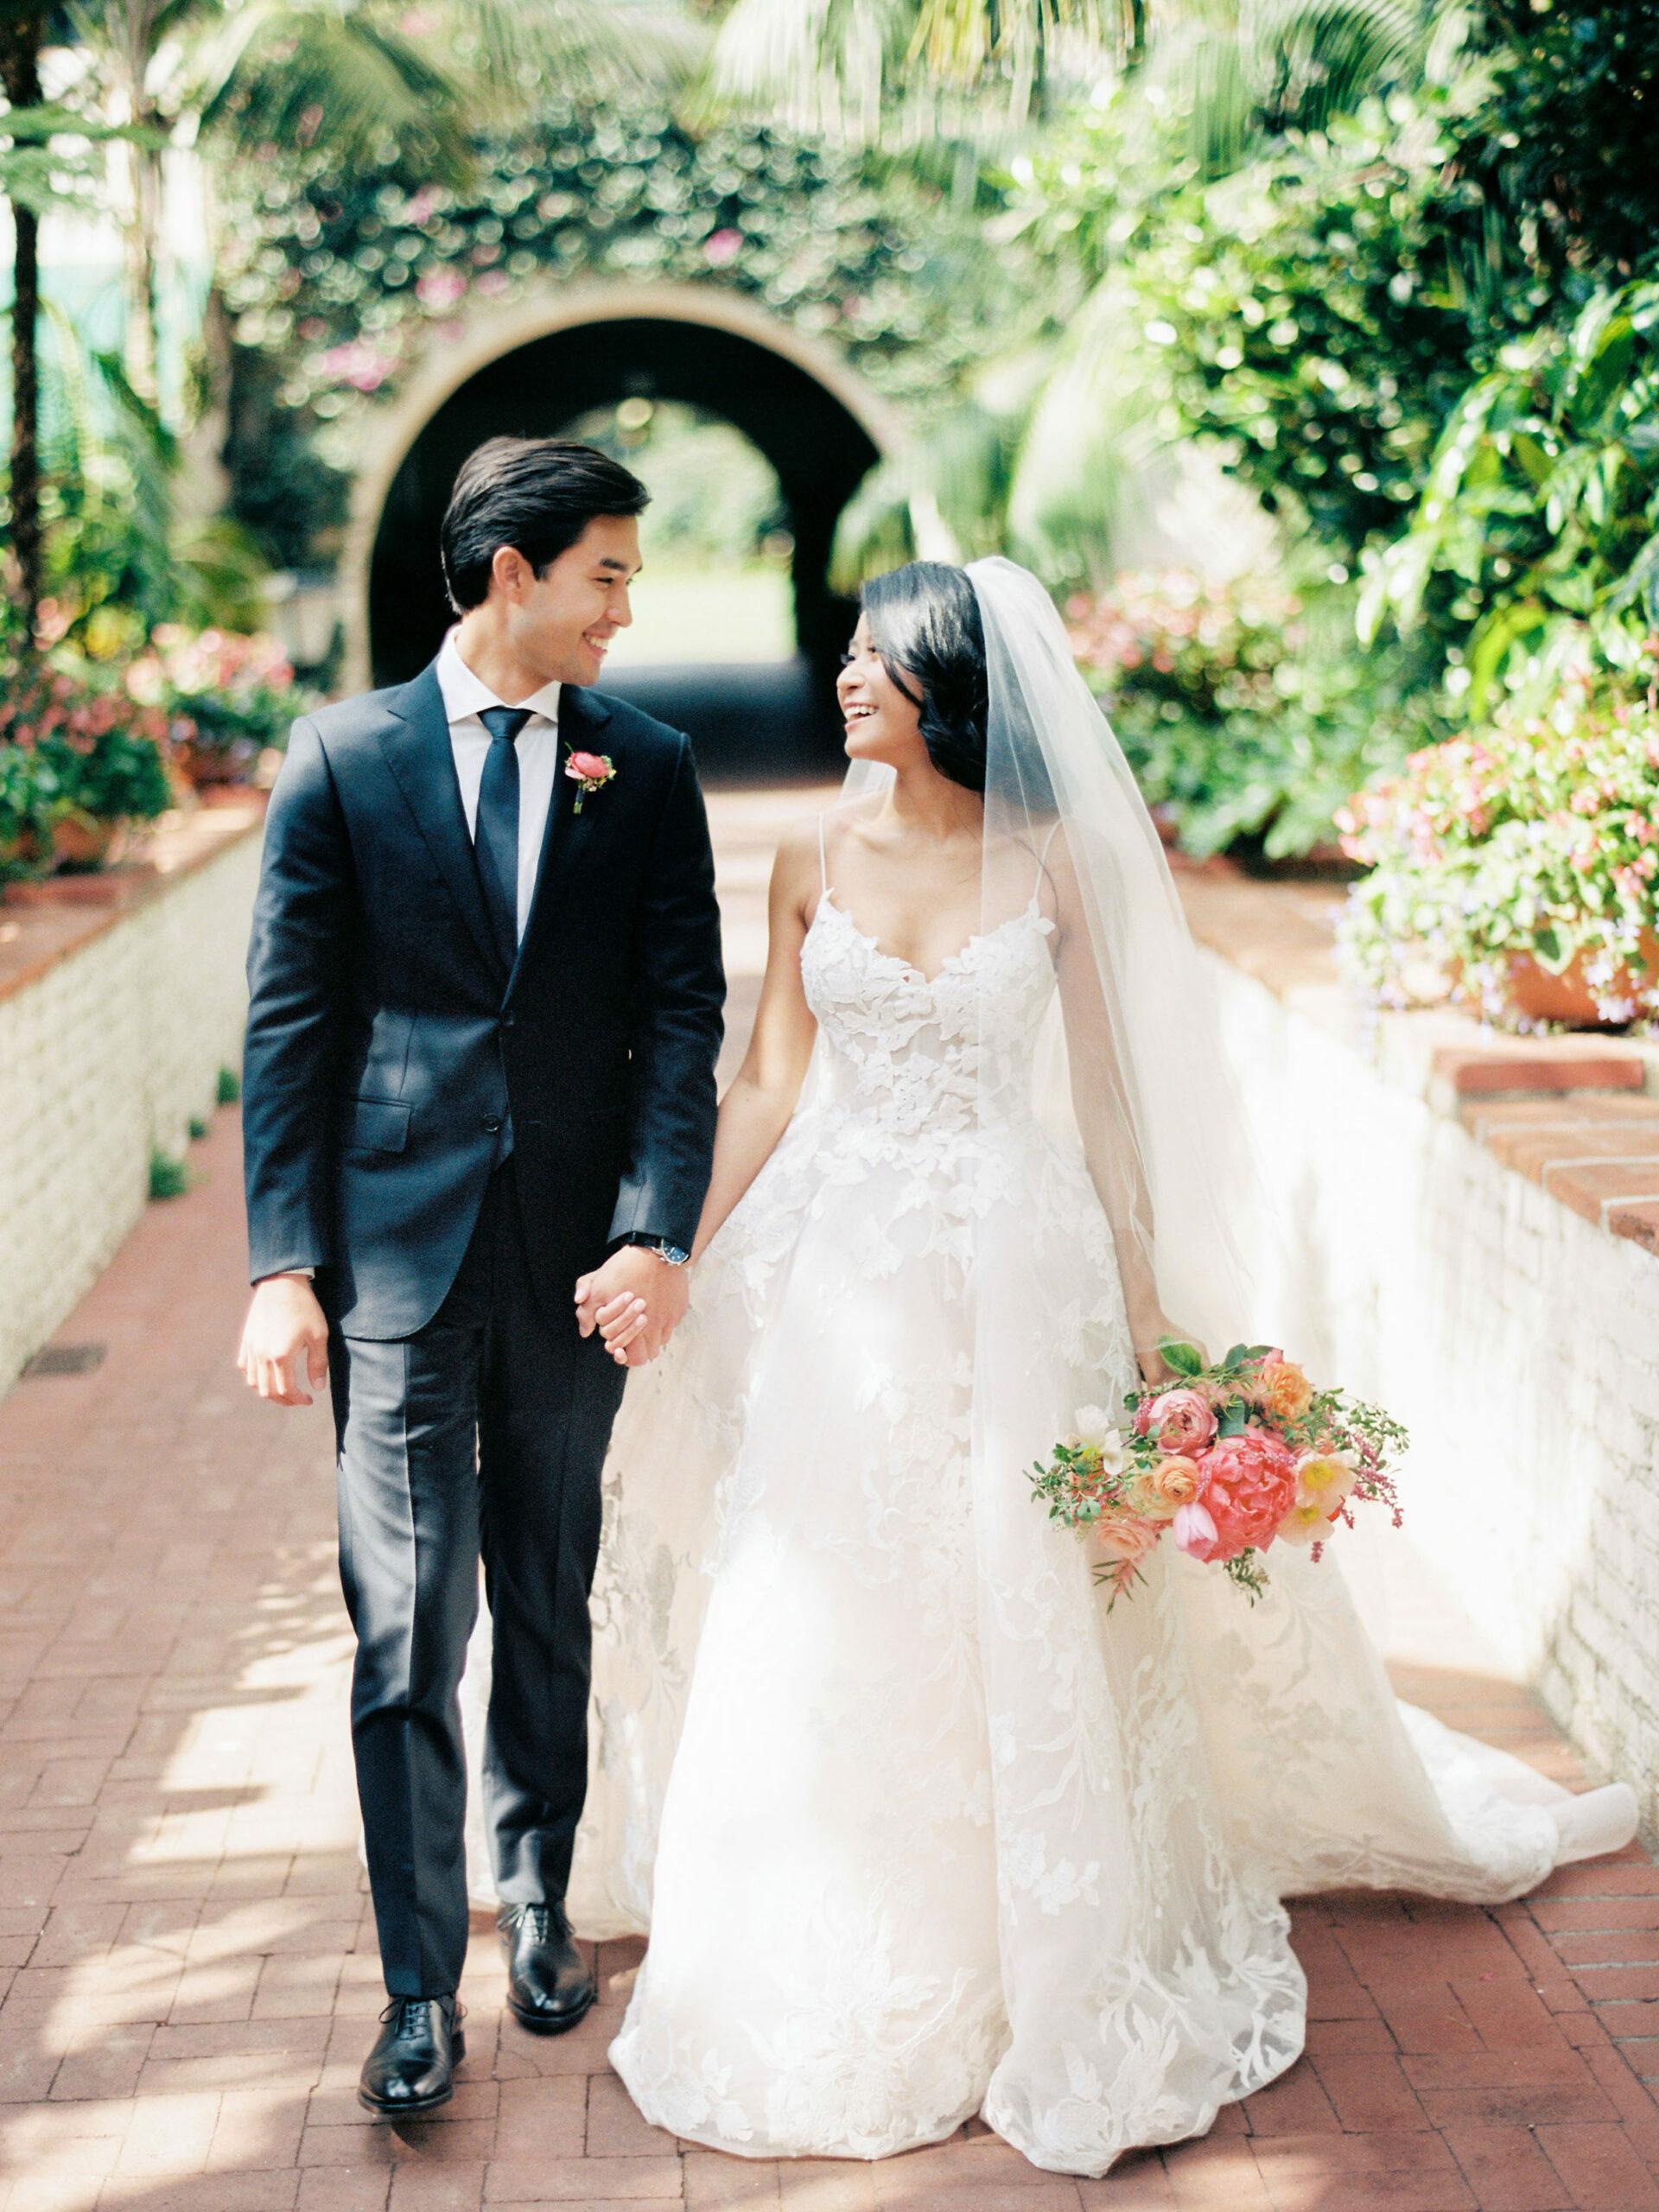 film wedding photos of couple at a four seasons Biltmore Santa Barbara wedding